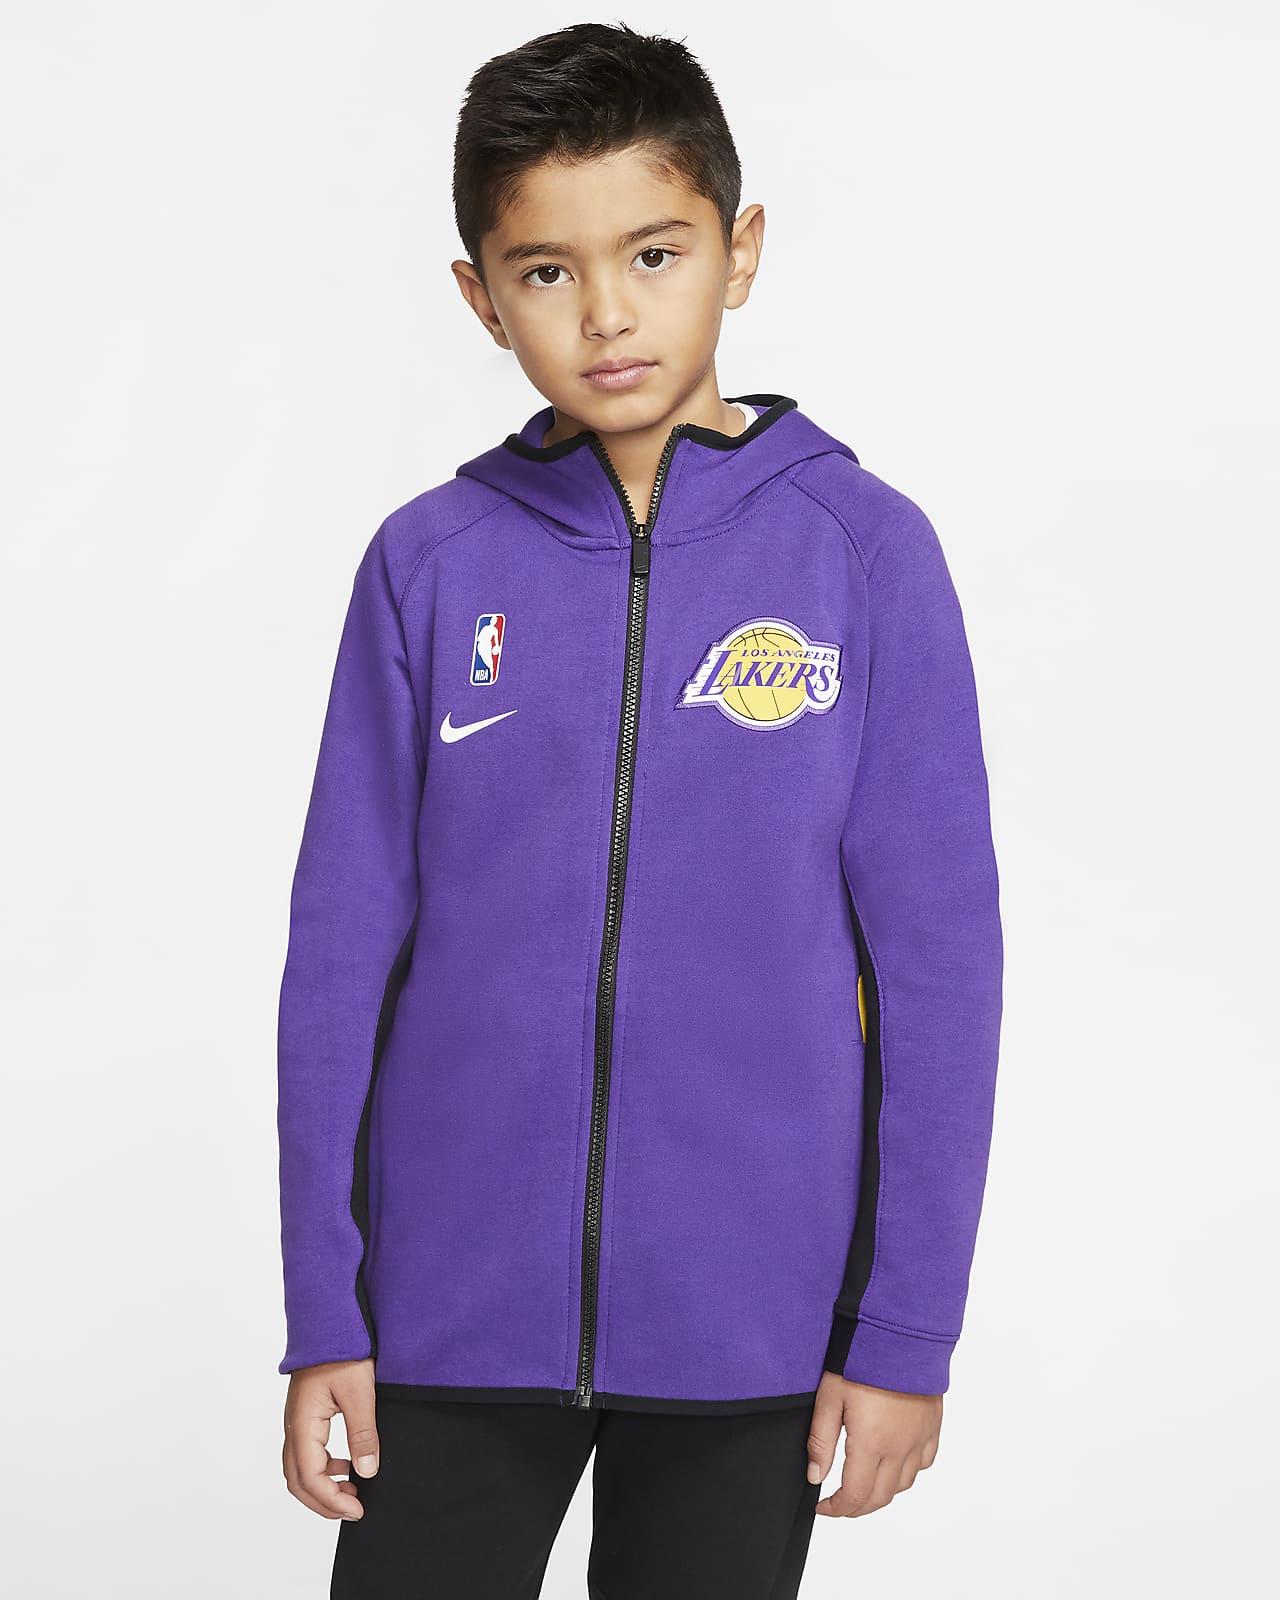 Lakers Showtime Older Kids' Nike Dri-FIT NBA Hoodie